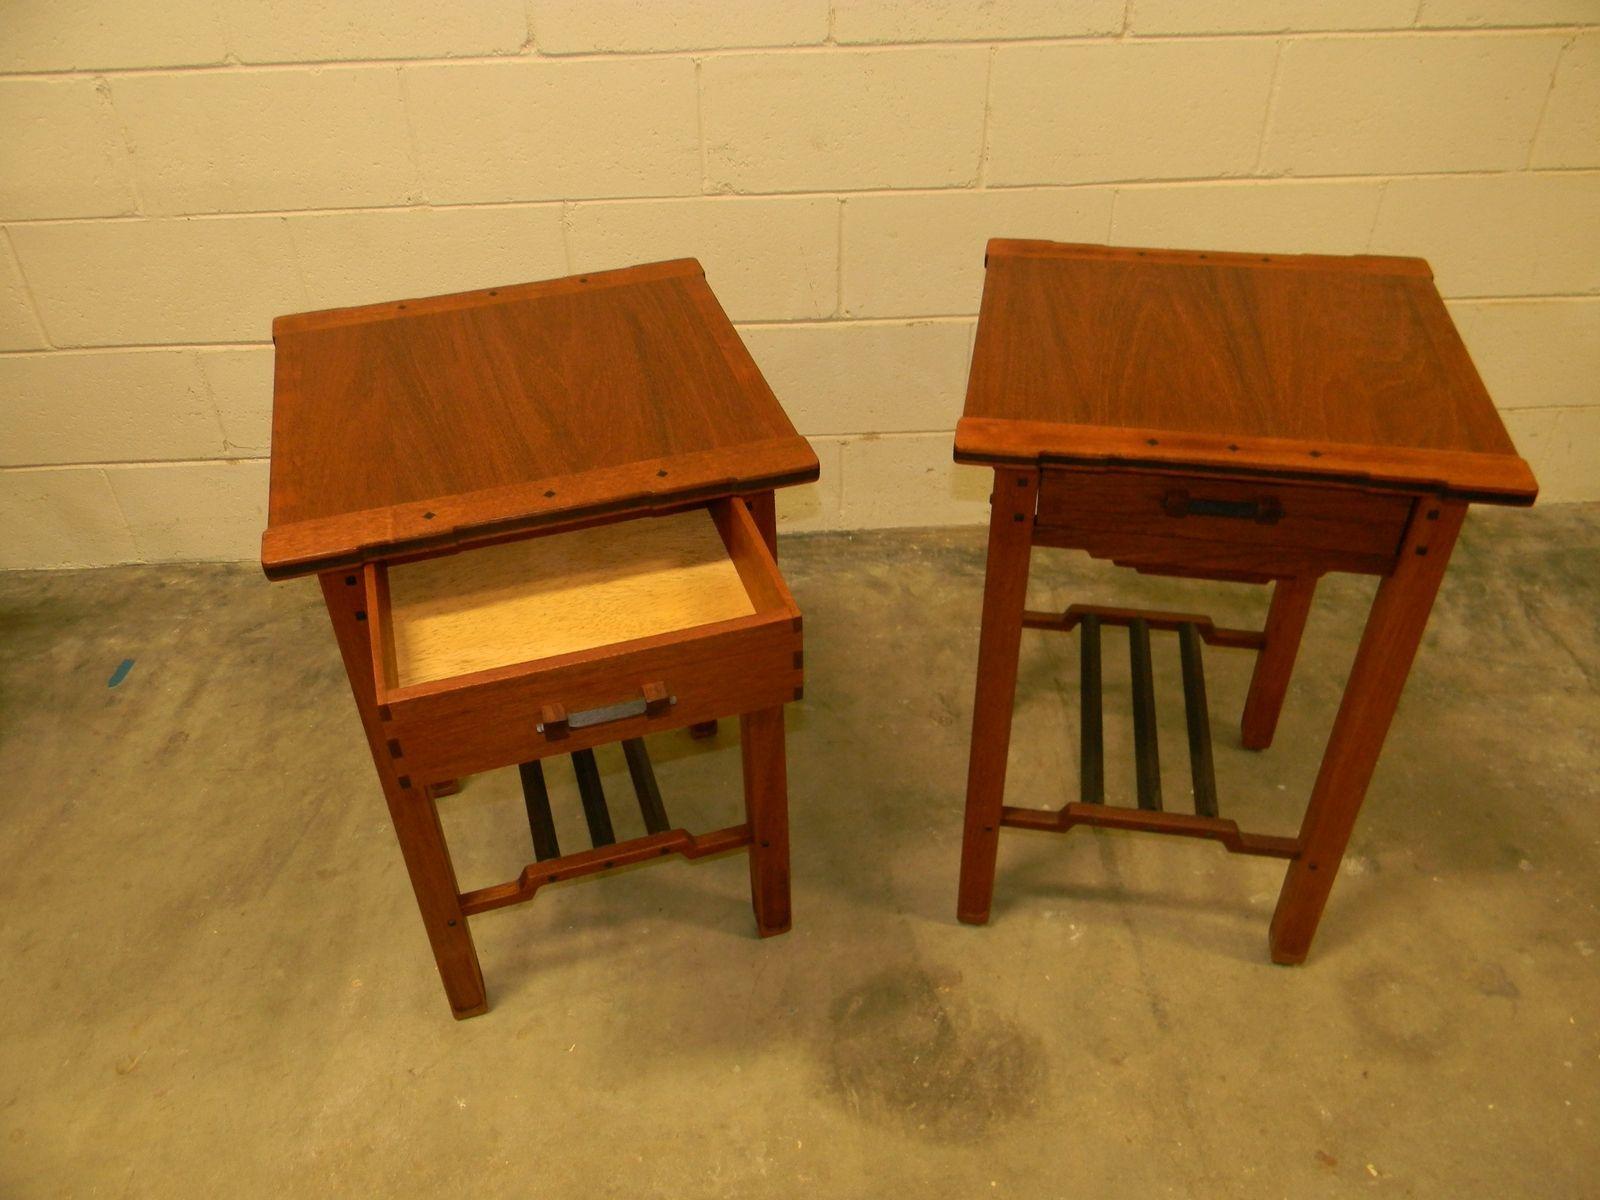 Greene and Greene Style Furniture and Decor